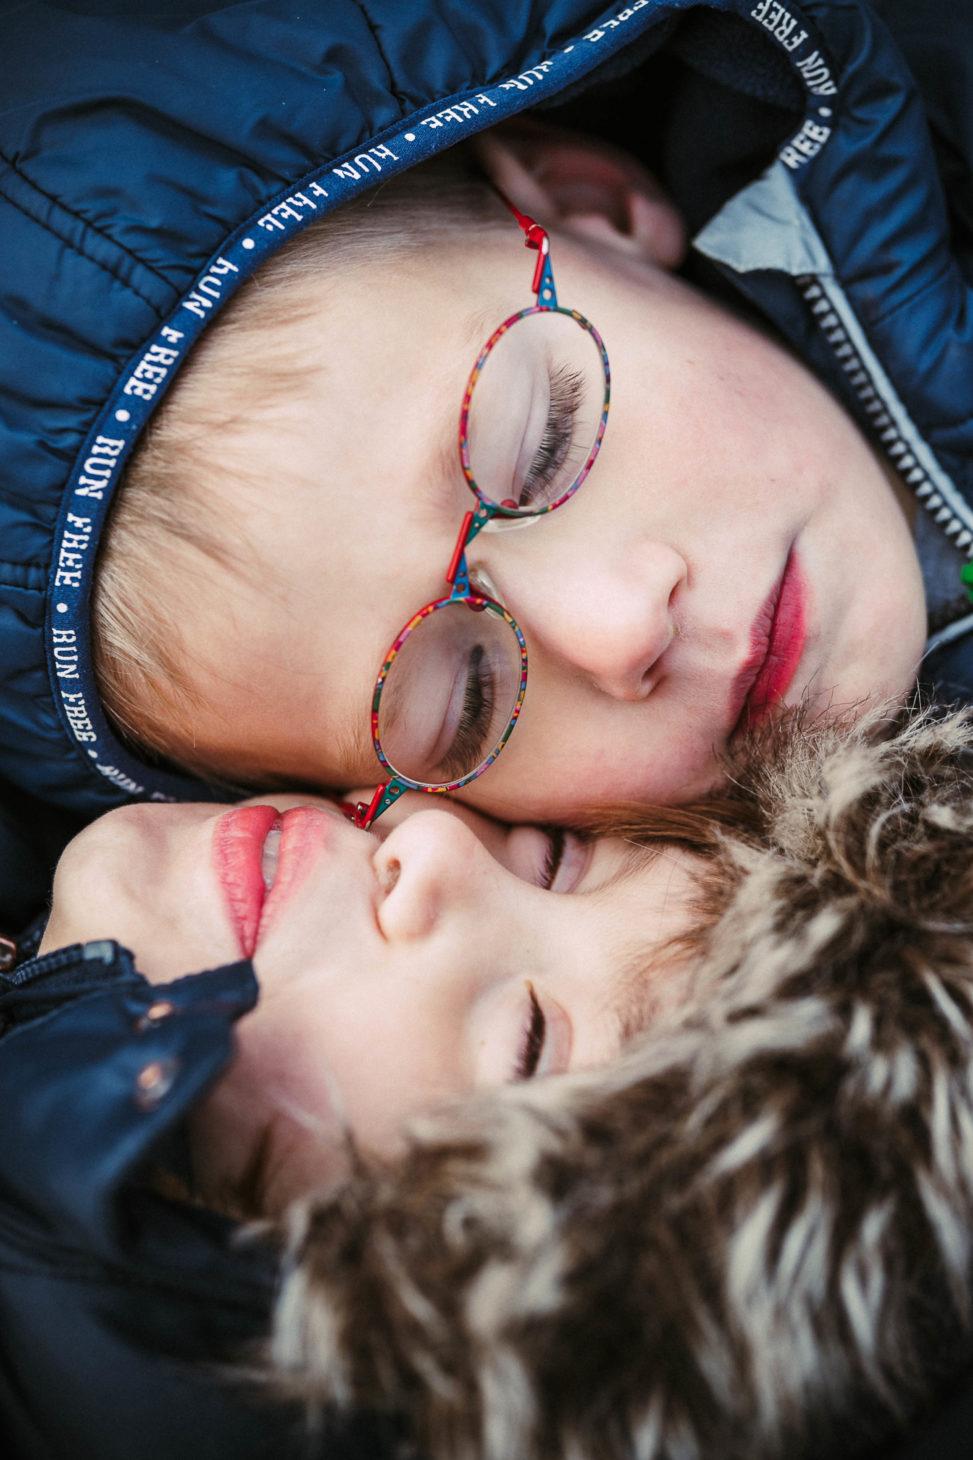 Geschwisterportrait, www.derbesteaugenblick.de